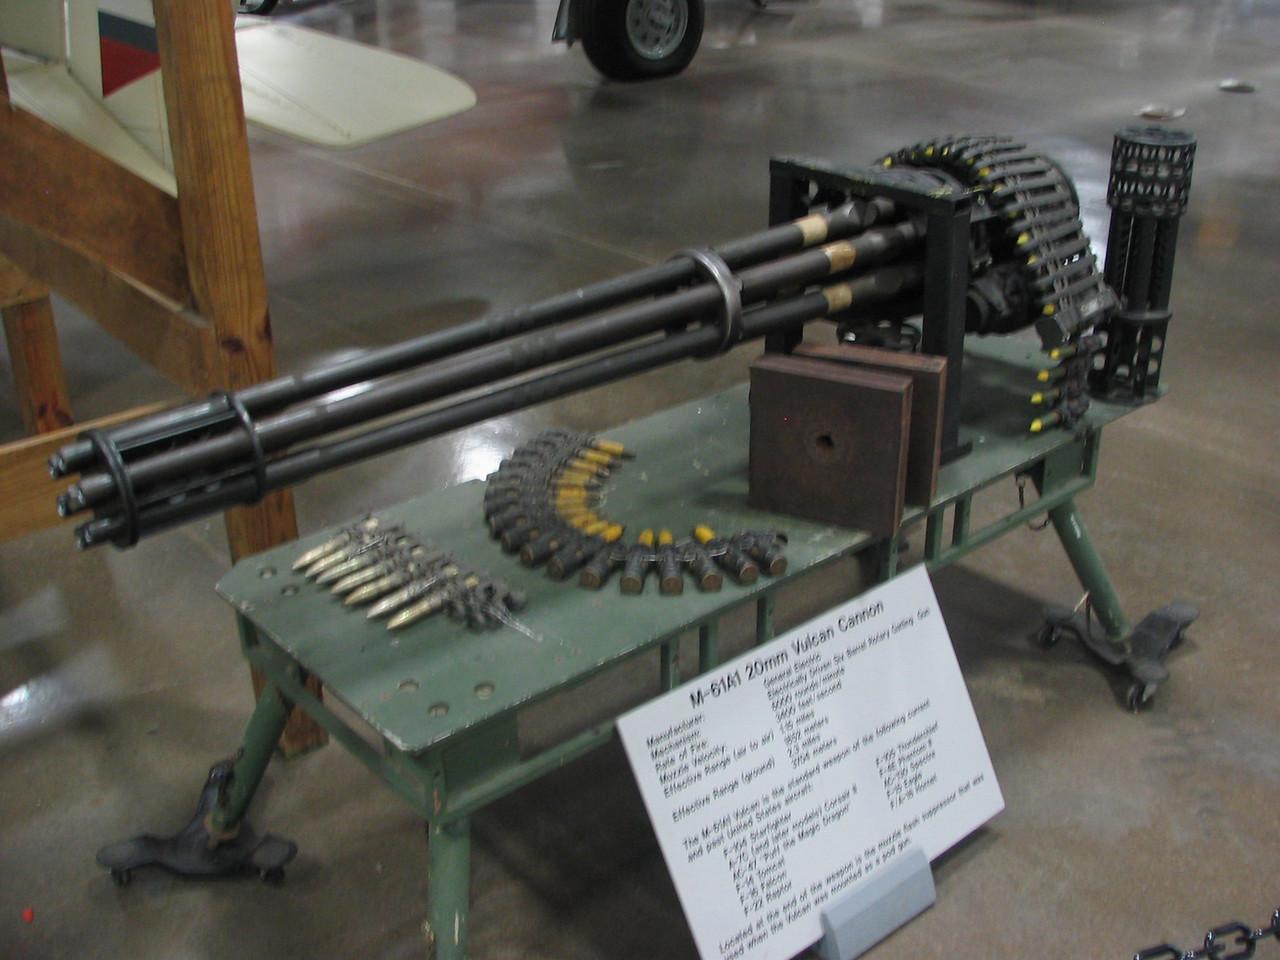 M-61A1 20mm Vulcan Cannon